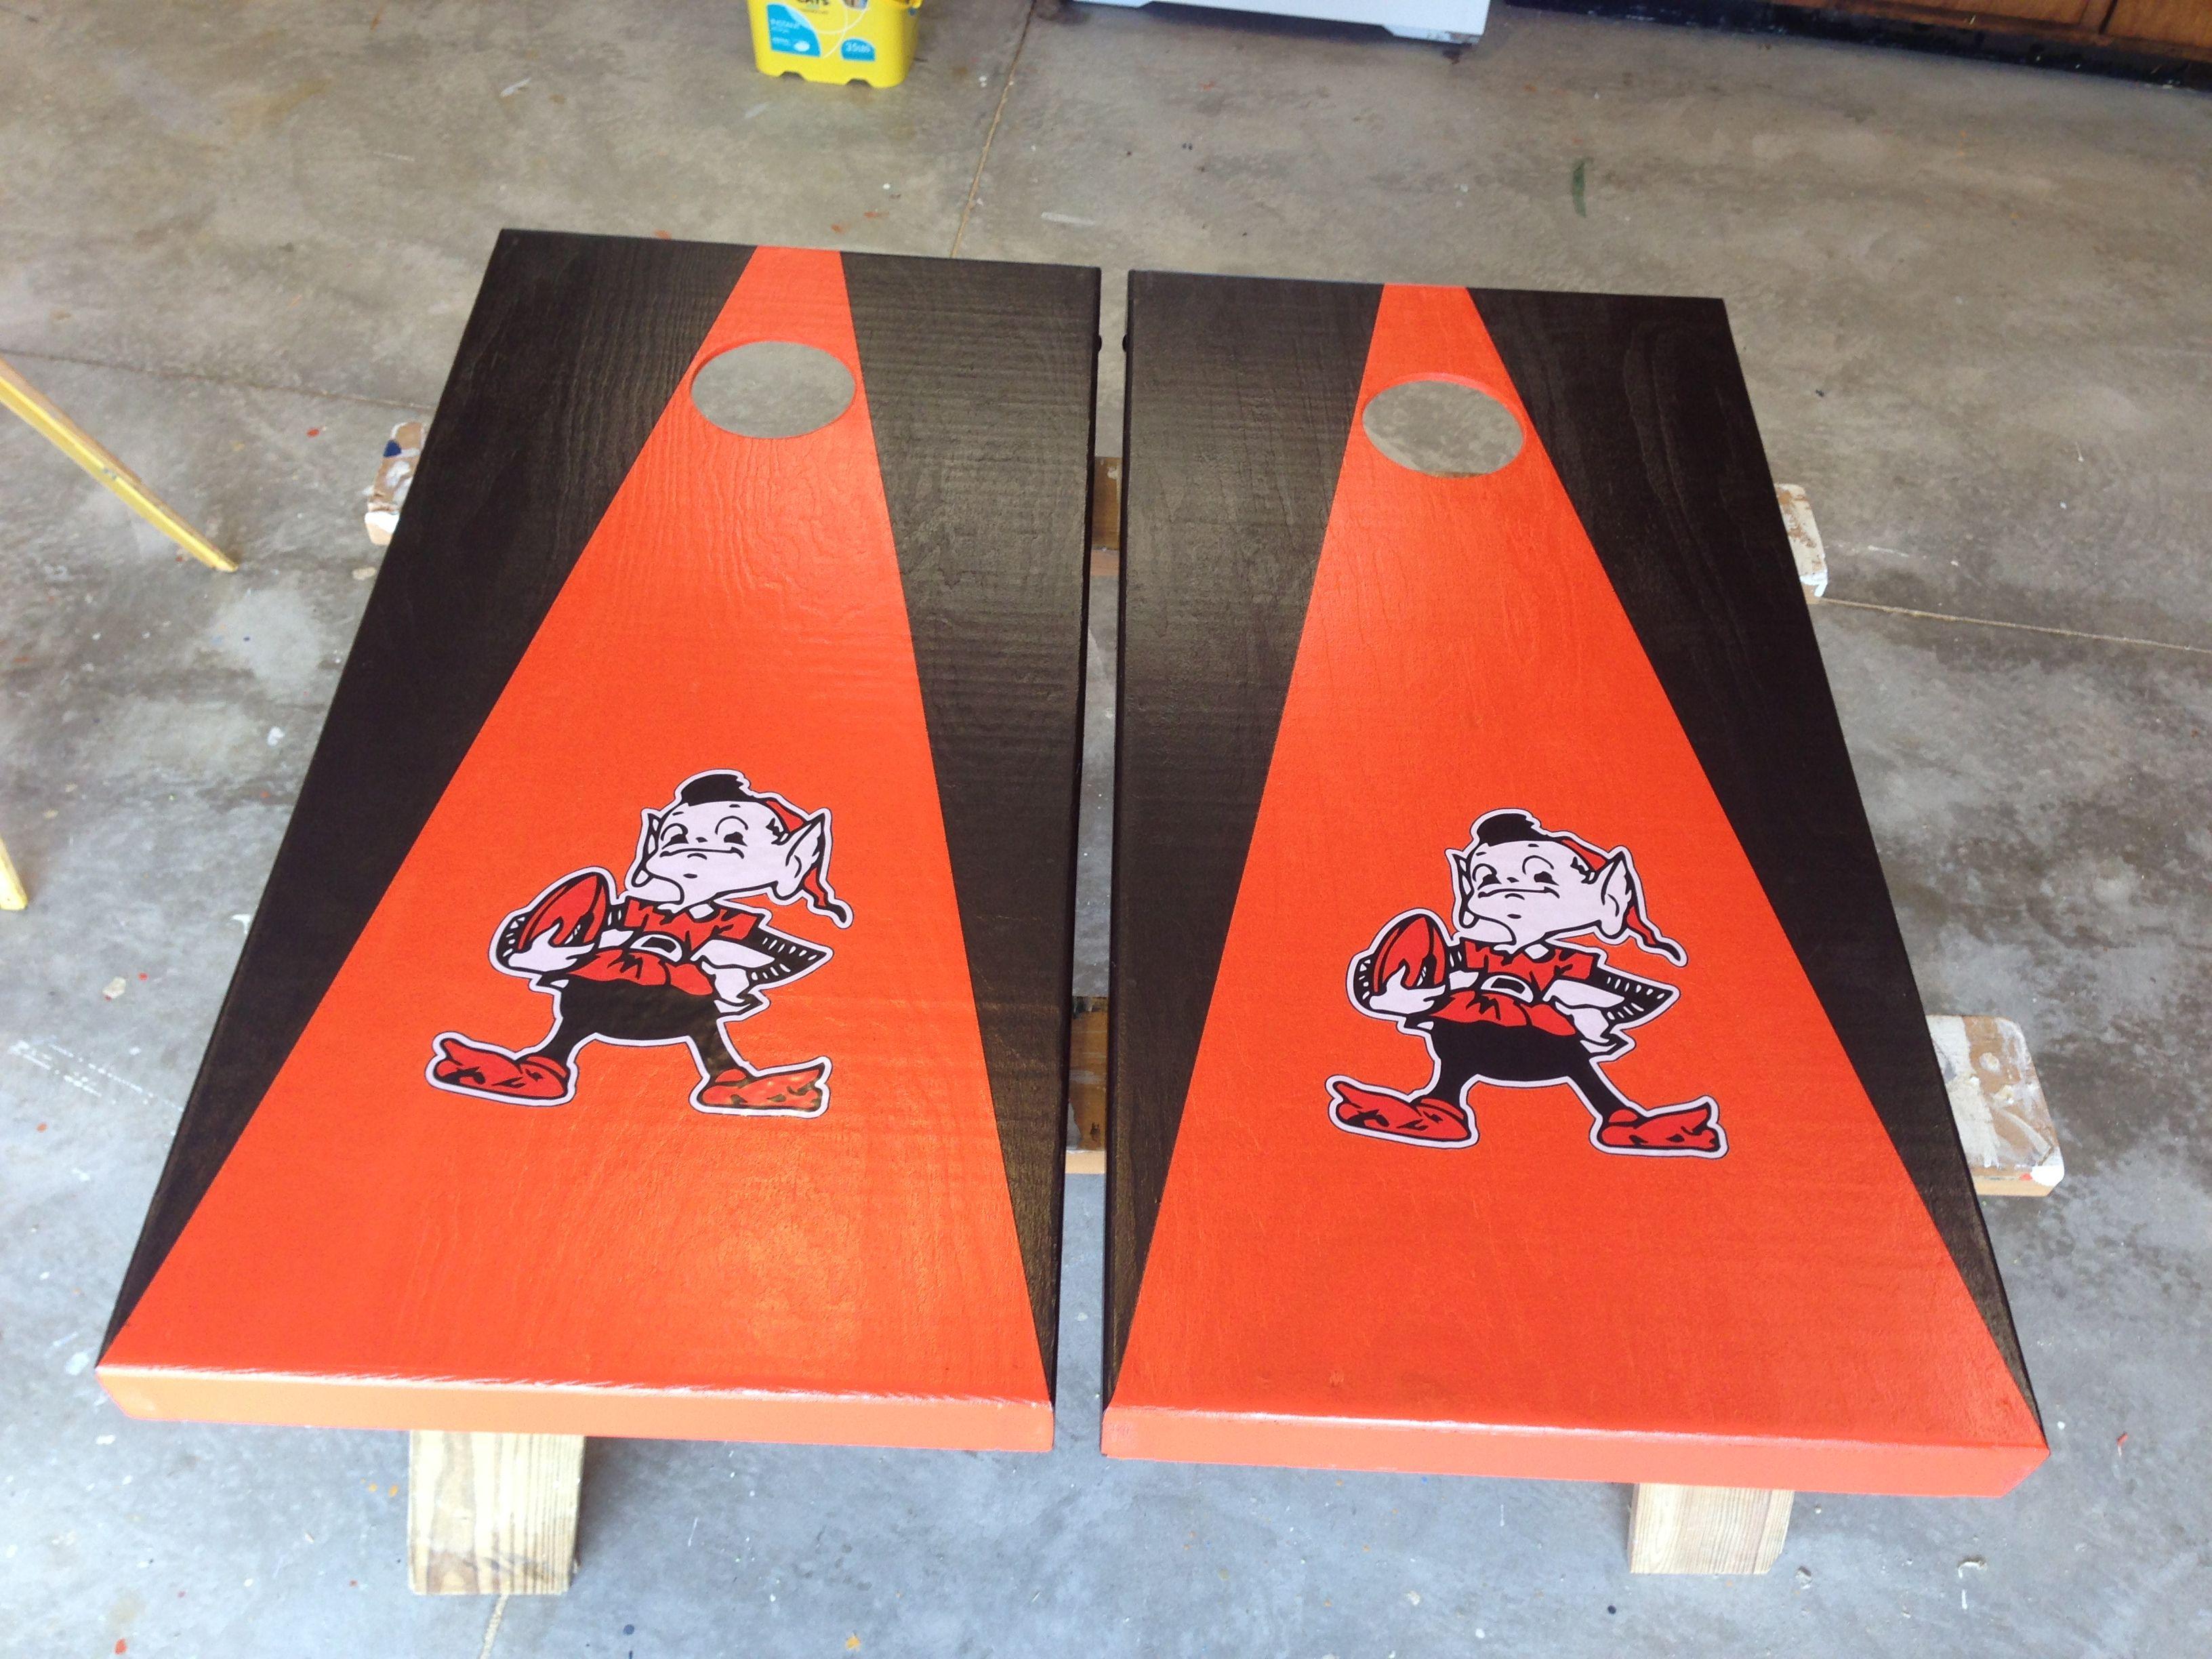 Cleveland Browns Elf Cornhole Boards Cornhole Cornhole Boards Browns Elf